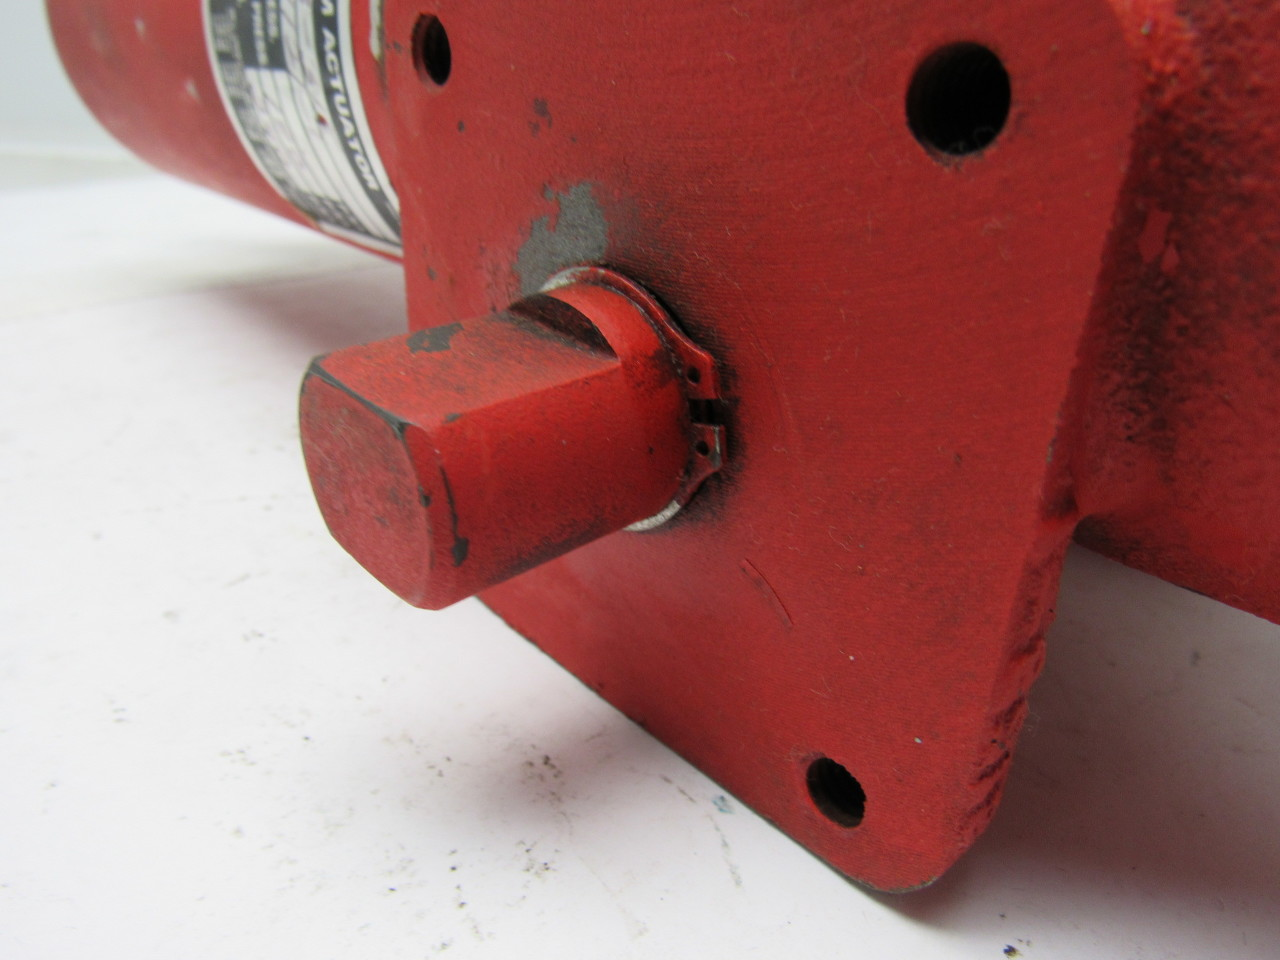 103709 bettis cb 315 robotarm pneumatic actuator 120psi 9 bettis actuator wiring diagram efcaviation com bettis actuator wiring diagrams at gsmportal.co